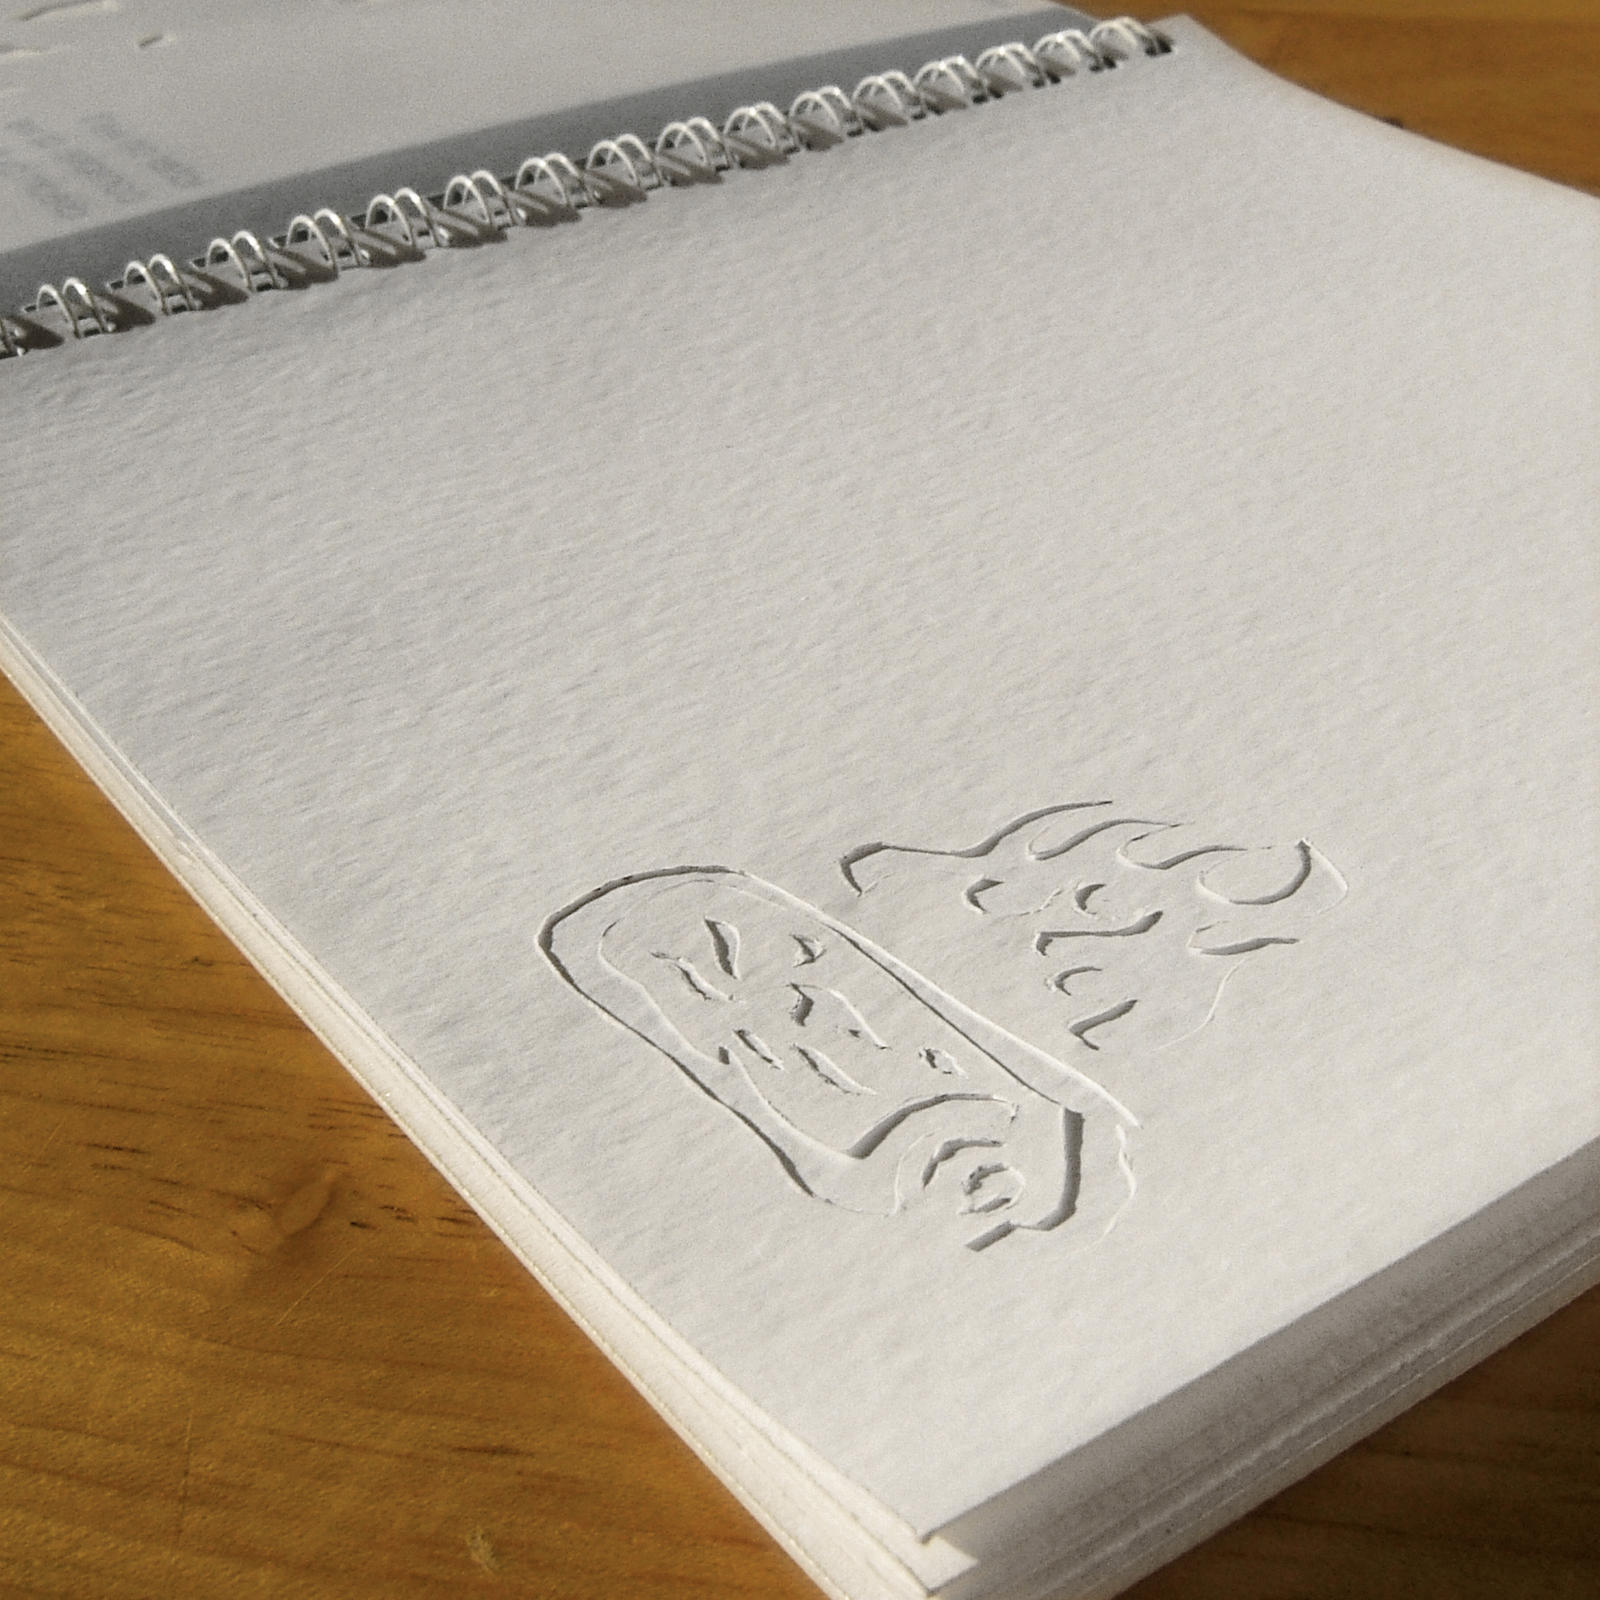 Paper Samples Booklet by Tristan-AtTheEnd on DeviantArt